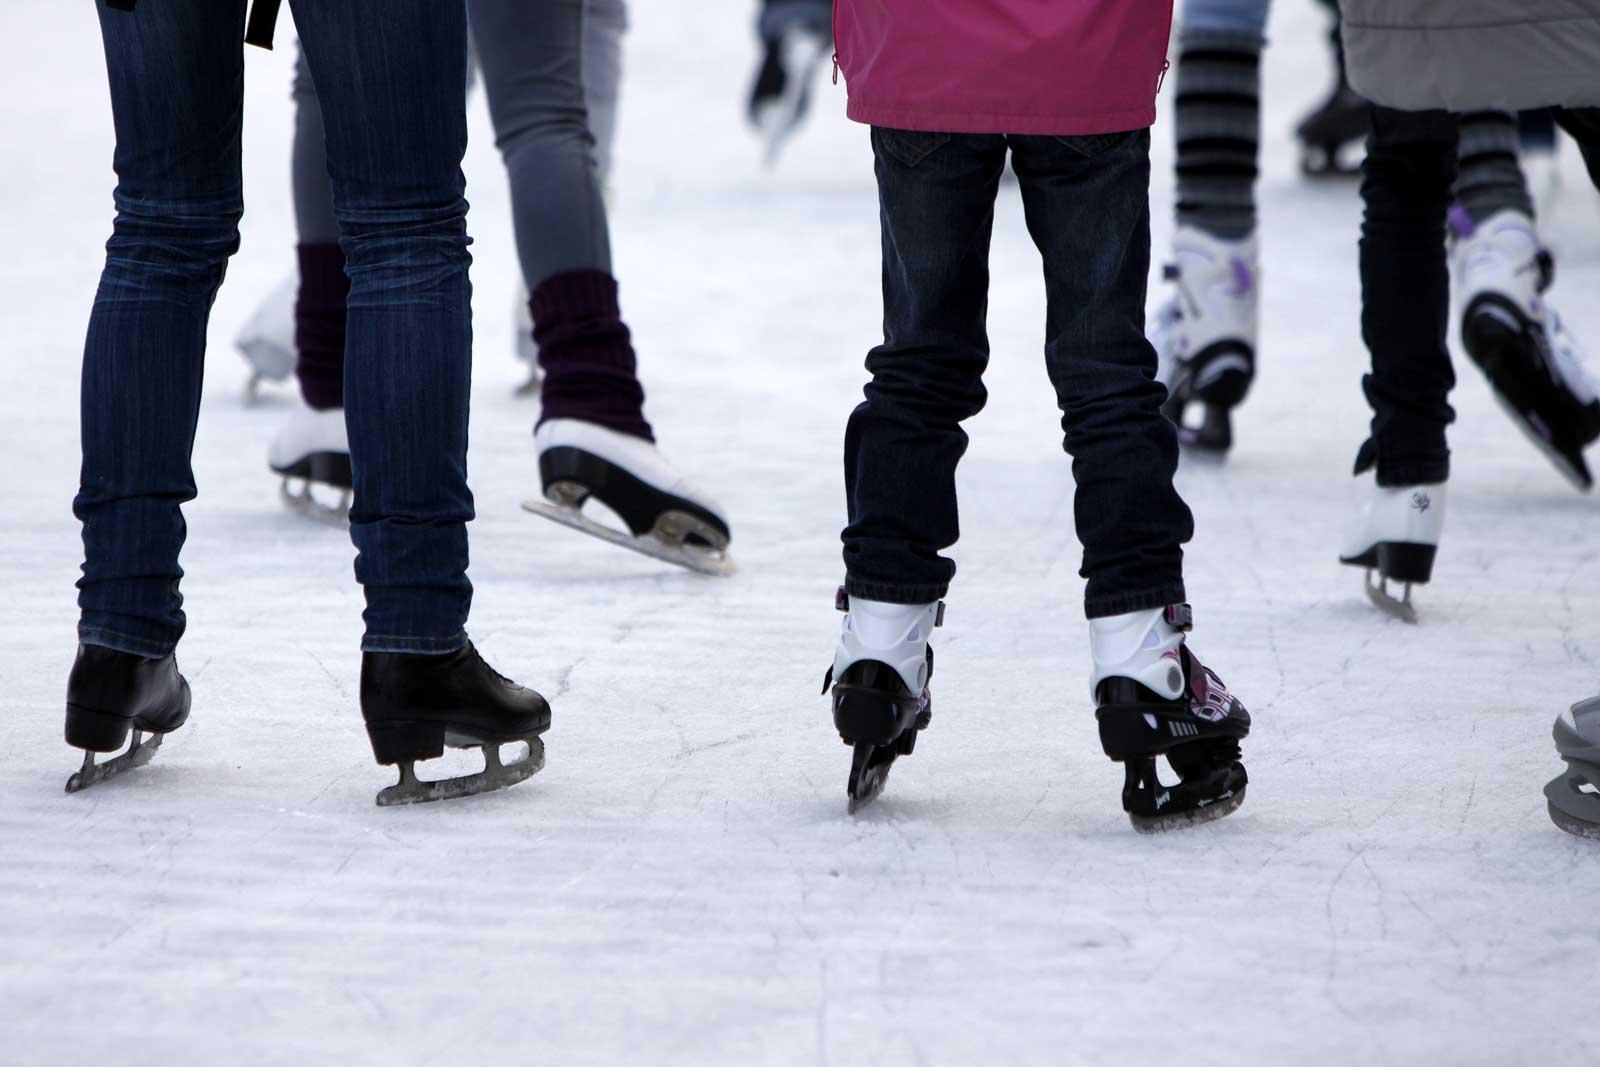 public skating, skates